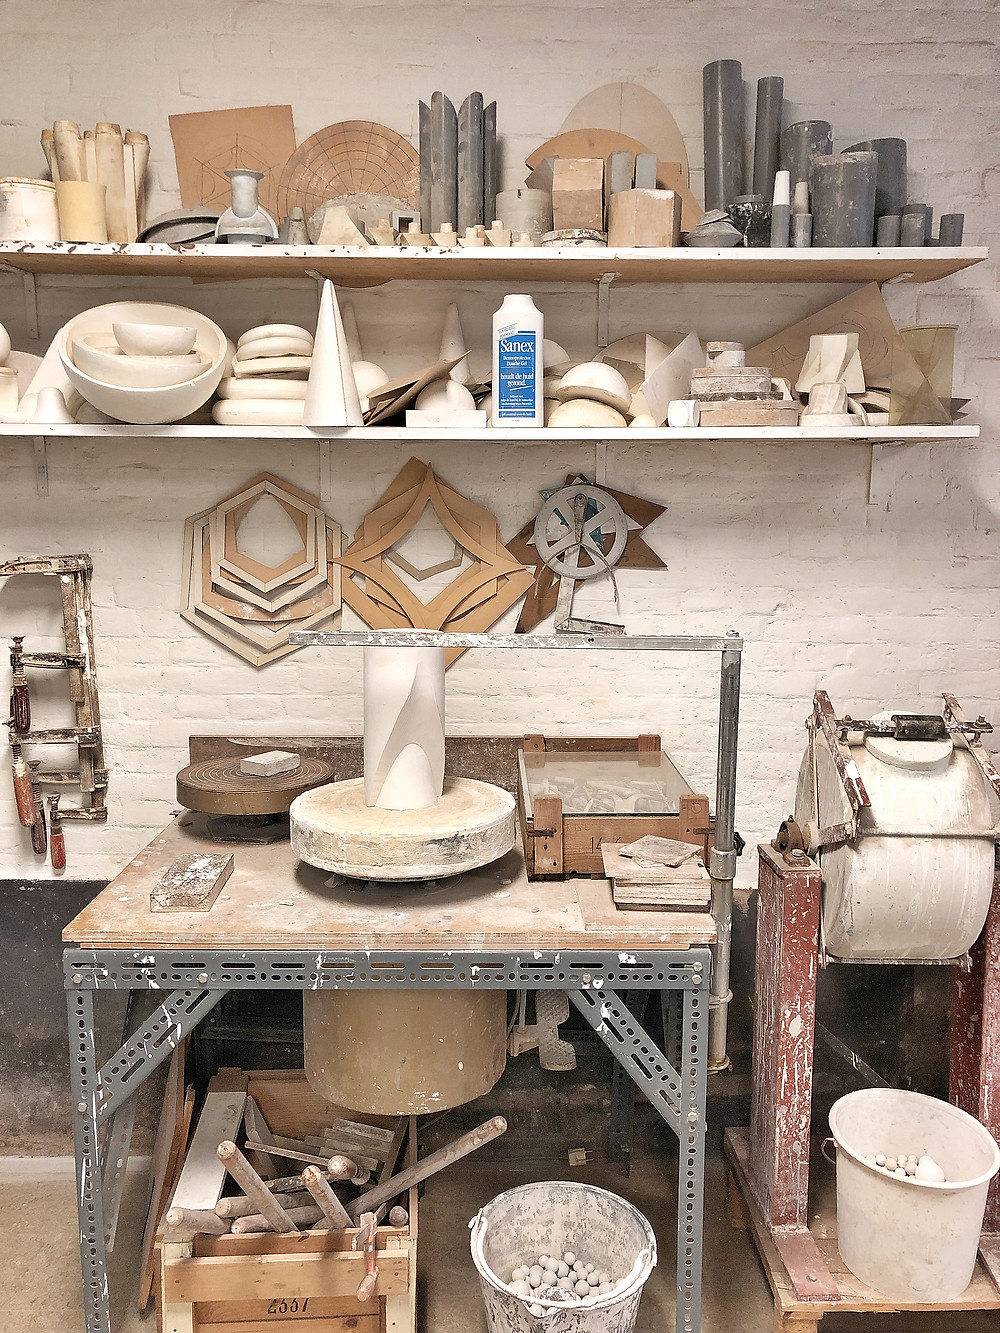 Princessehof National Museum of Ceramics, Leeuwarden